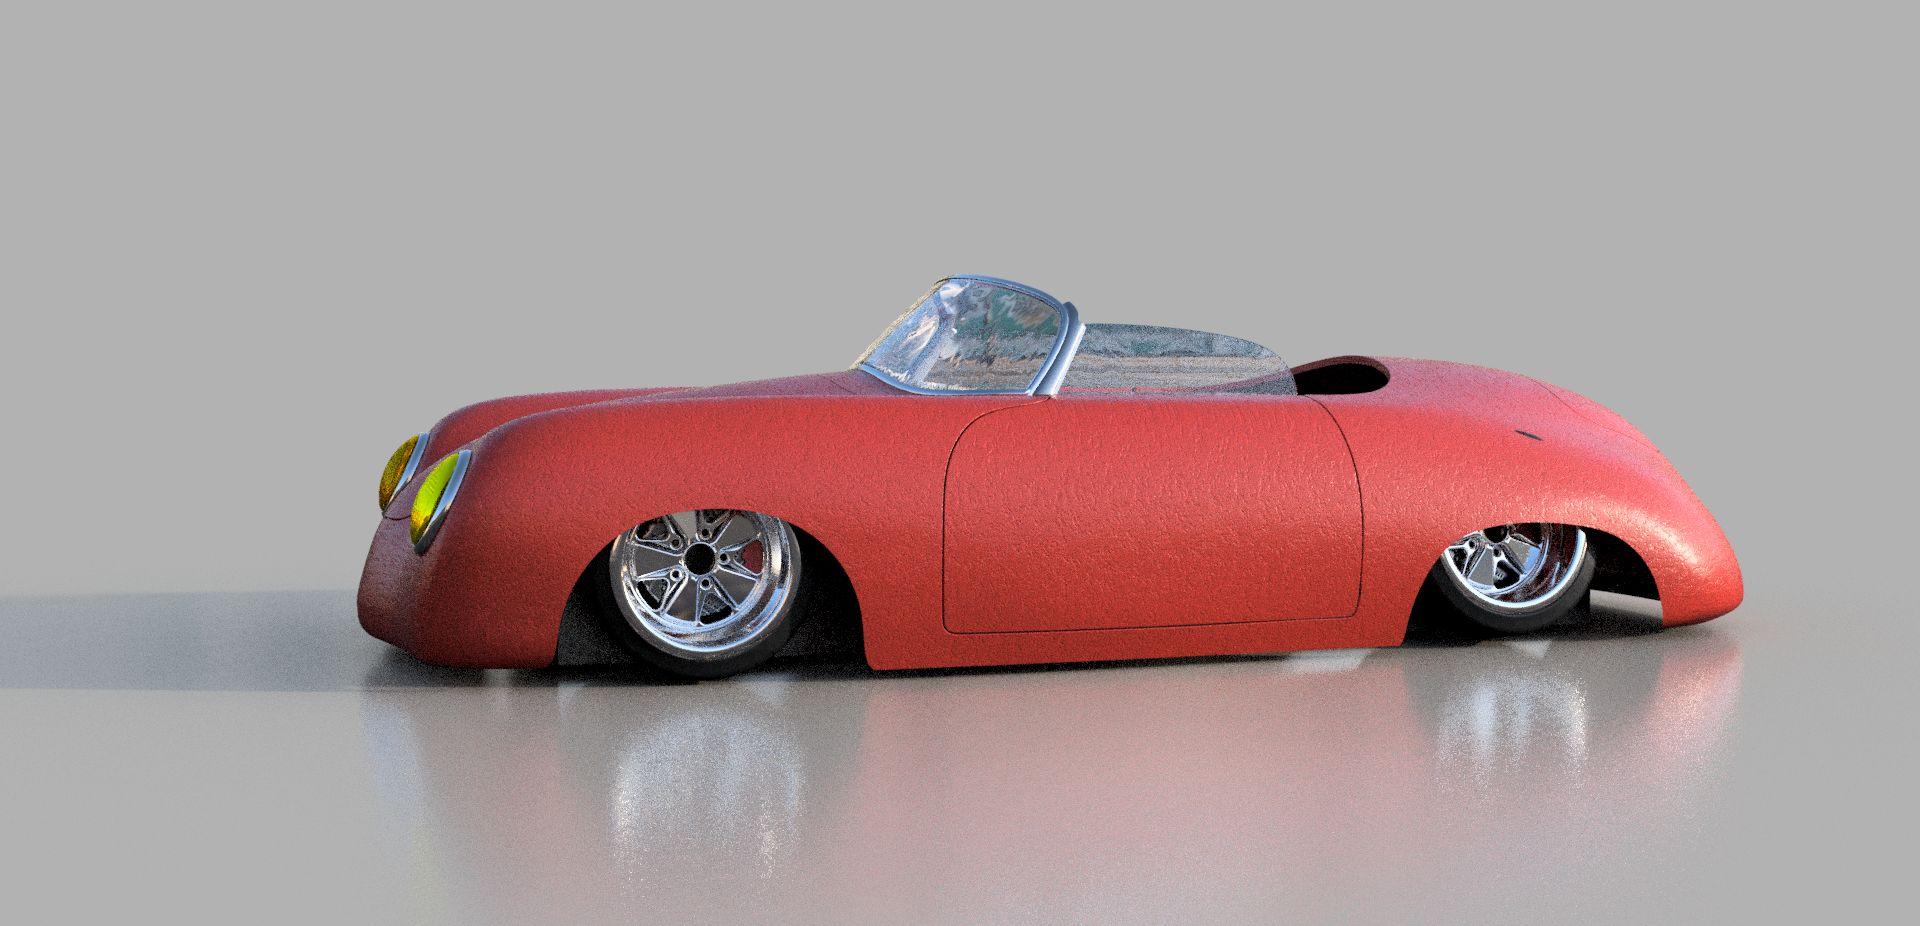 356-speedster-3-3500-3500